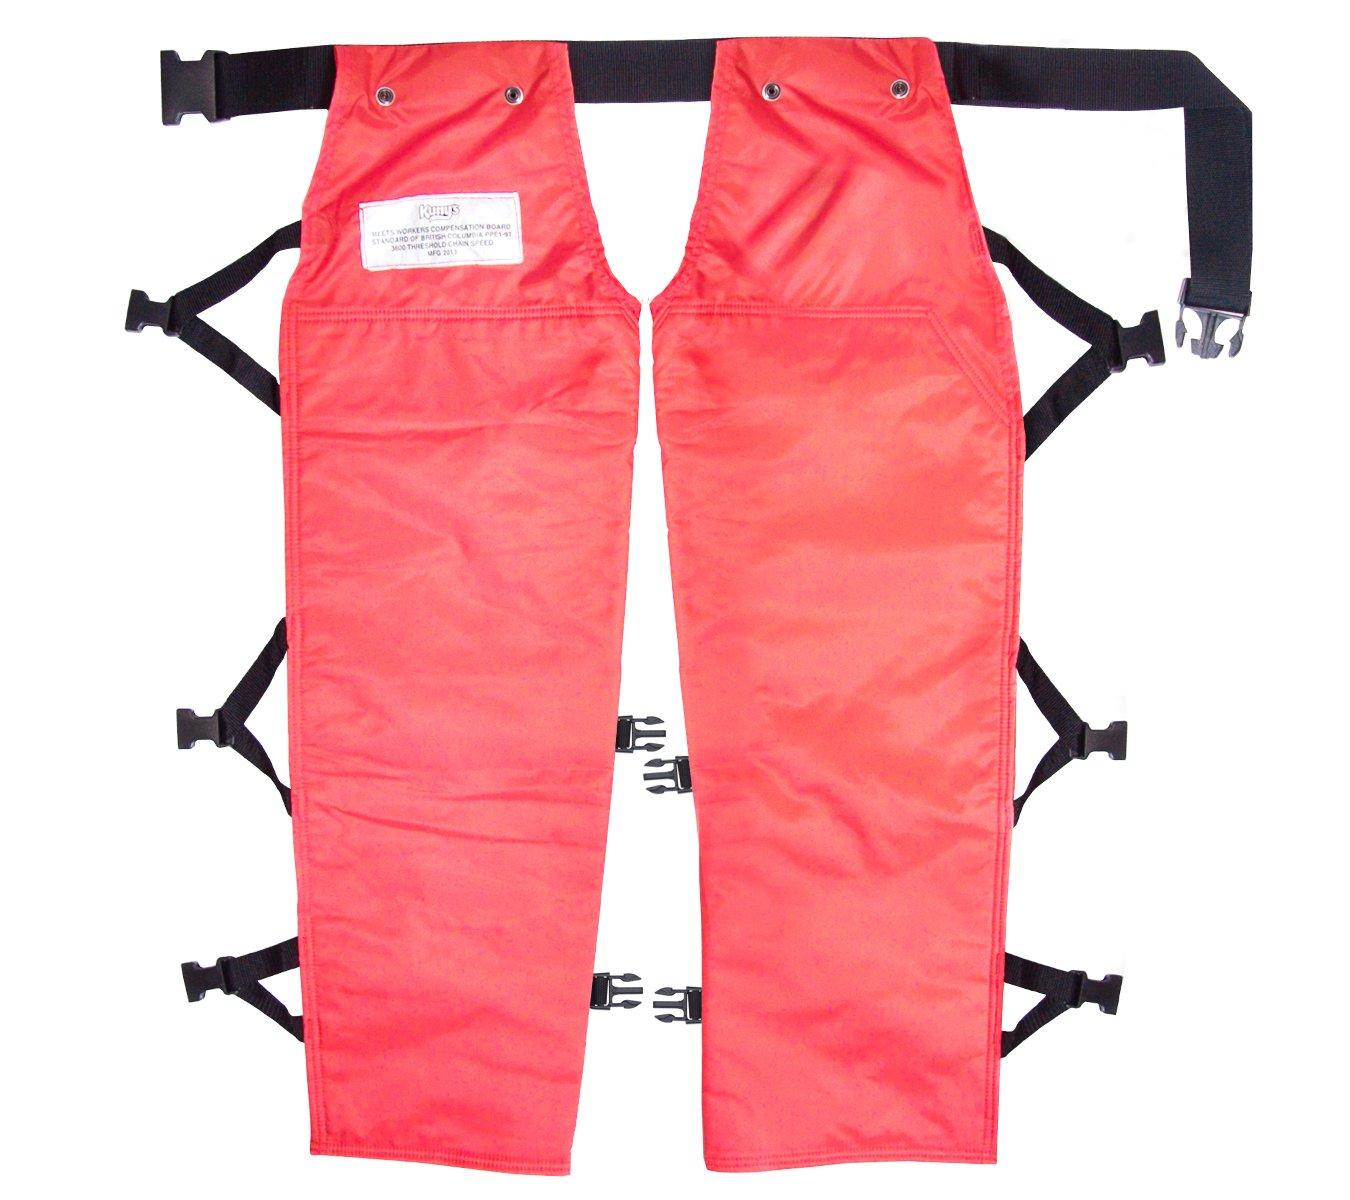 Custom Leathercraft AP212K Work Gear Chain Saw Chaps Fits Waists Upto 40-Inch by Custom Leathercraft  B00HX325KA